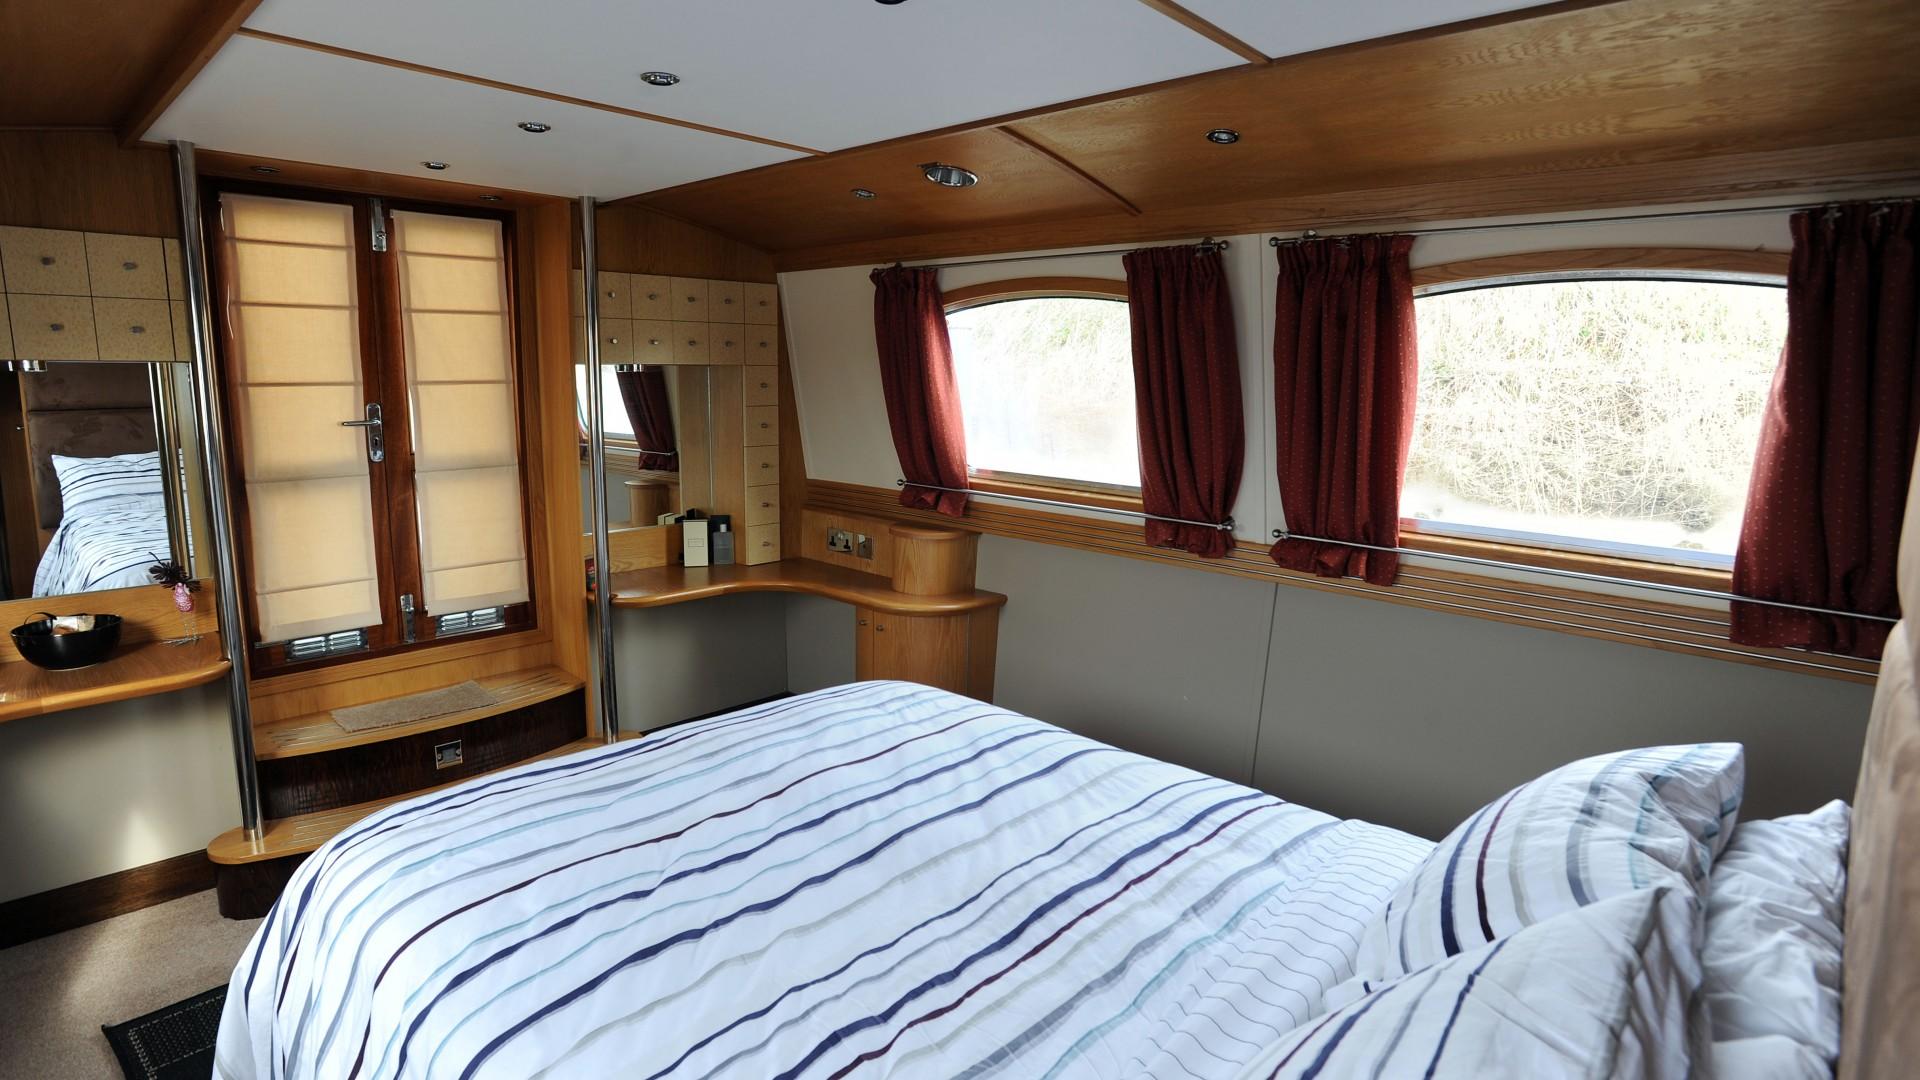 Estate in barca - 2 4